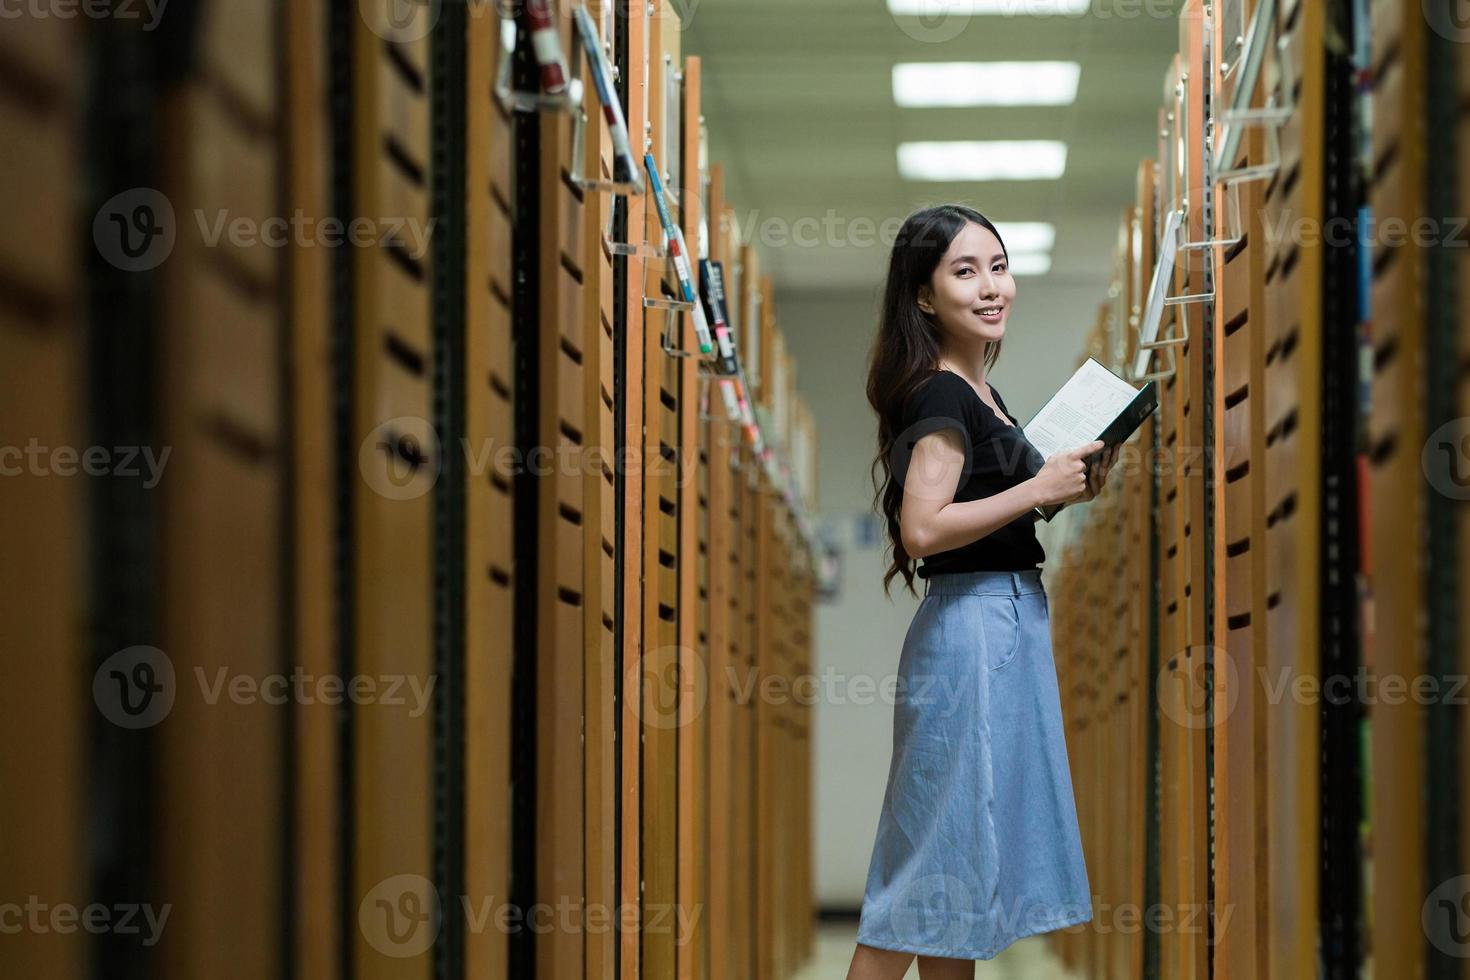 Studenten in der Bibliothek foto